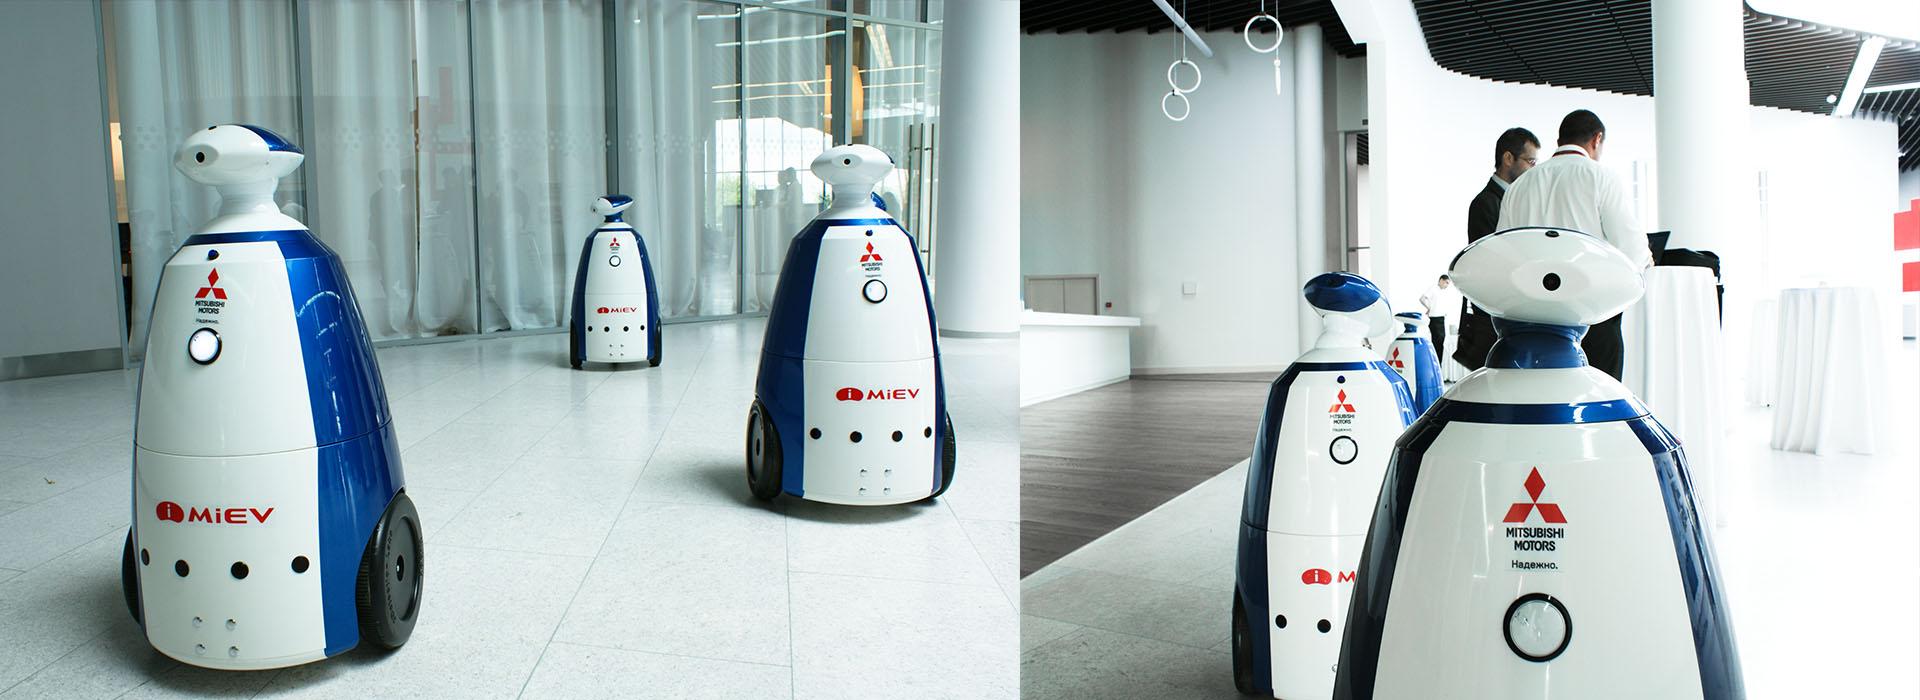 robotics production corporate identity, производитель робототехники логотип